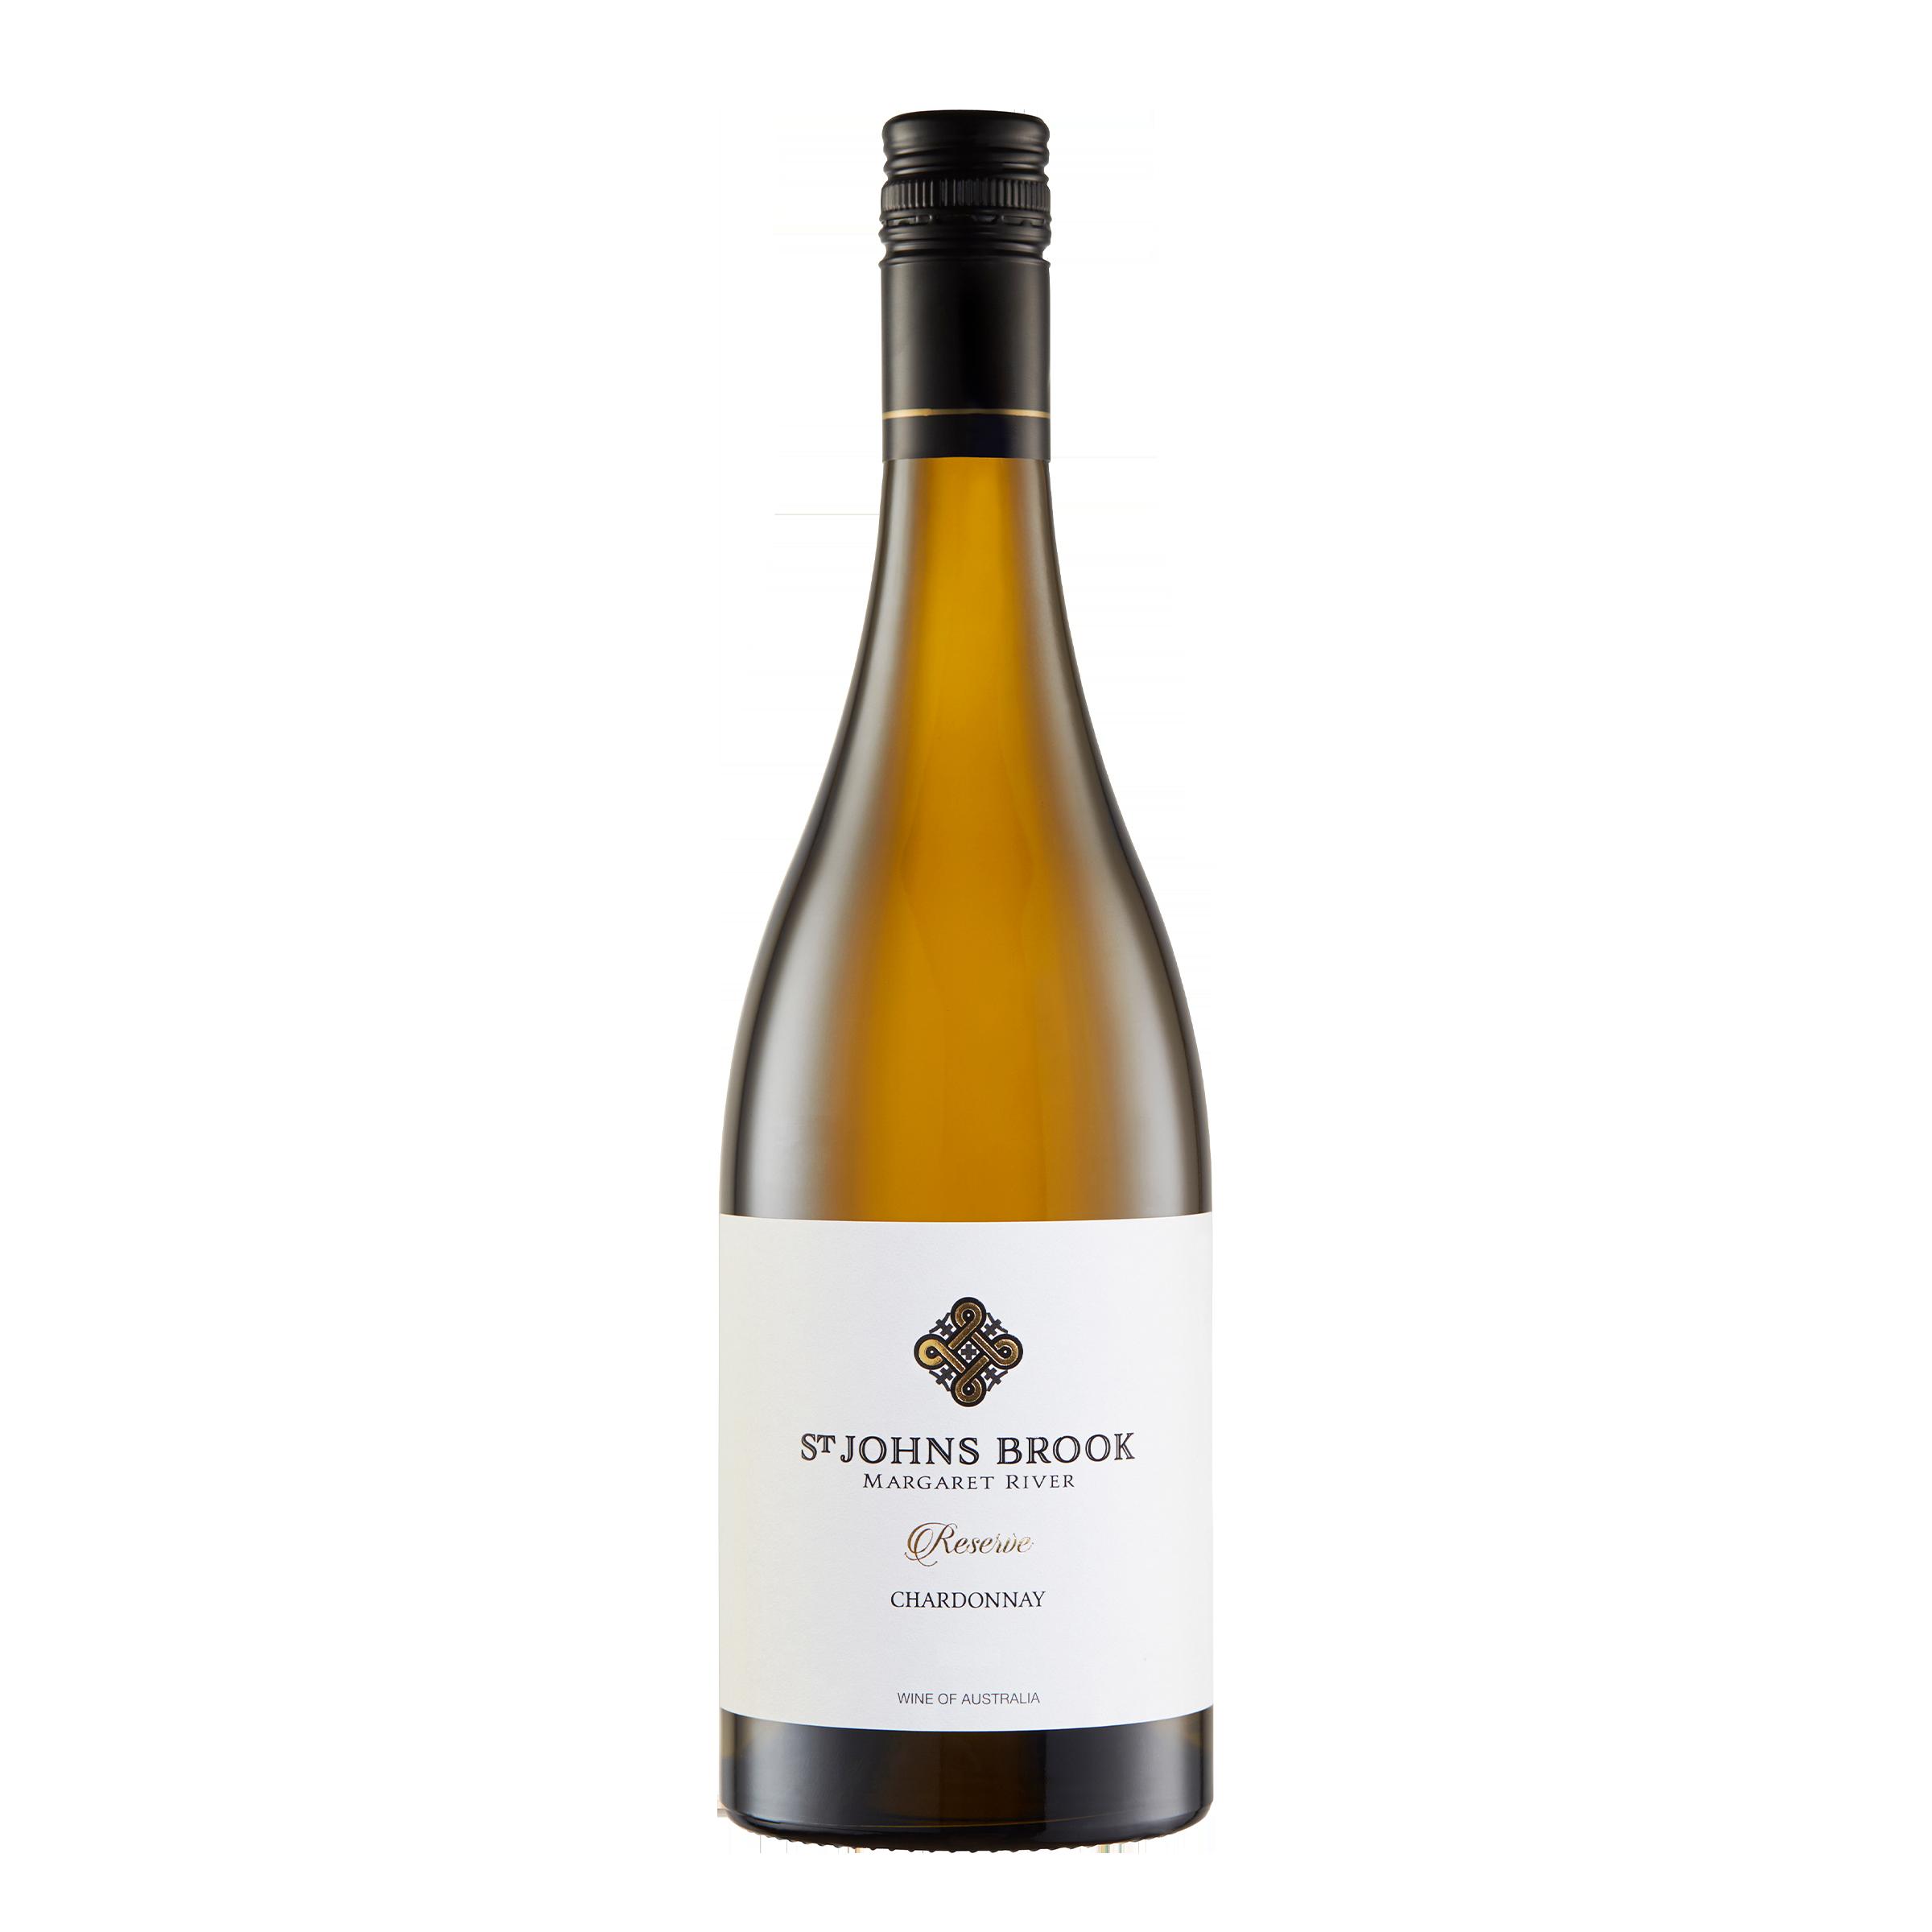 St Johns Brook Reserve Chardonnay